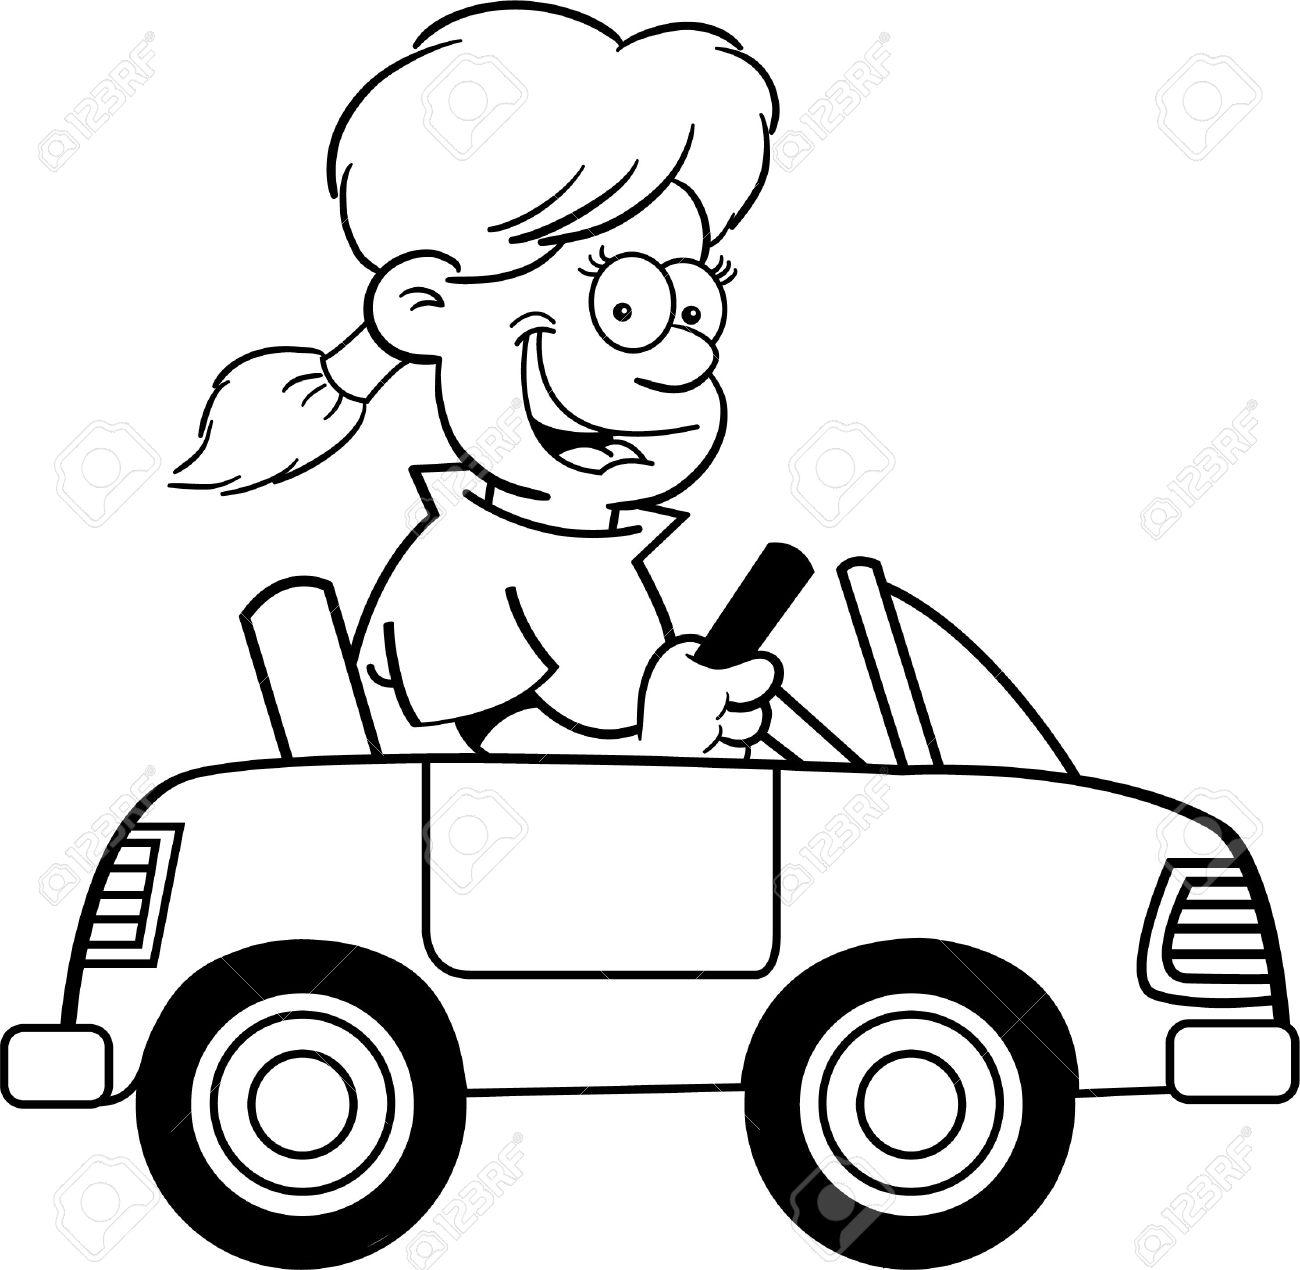 Black And White Car Drawing At Getdrawings